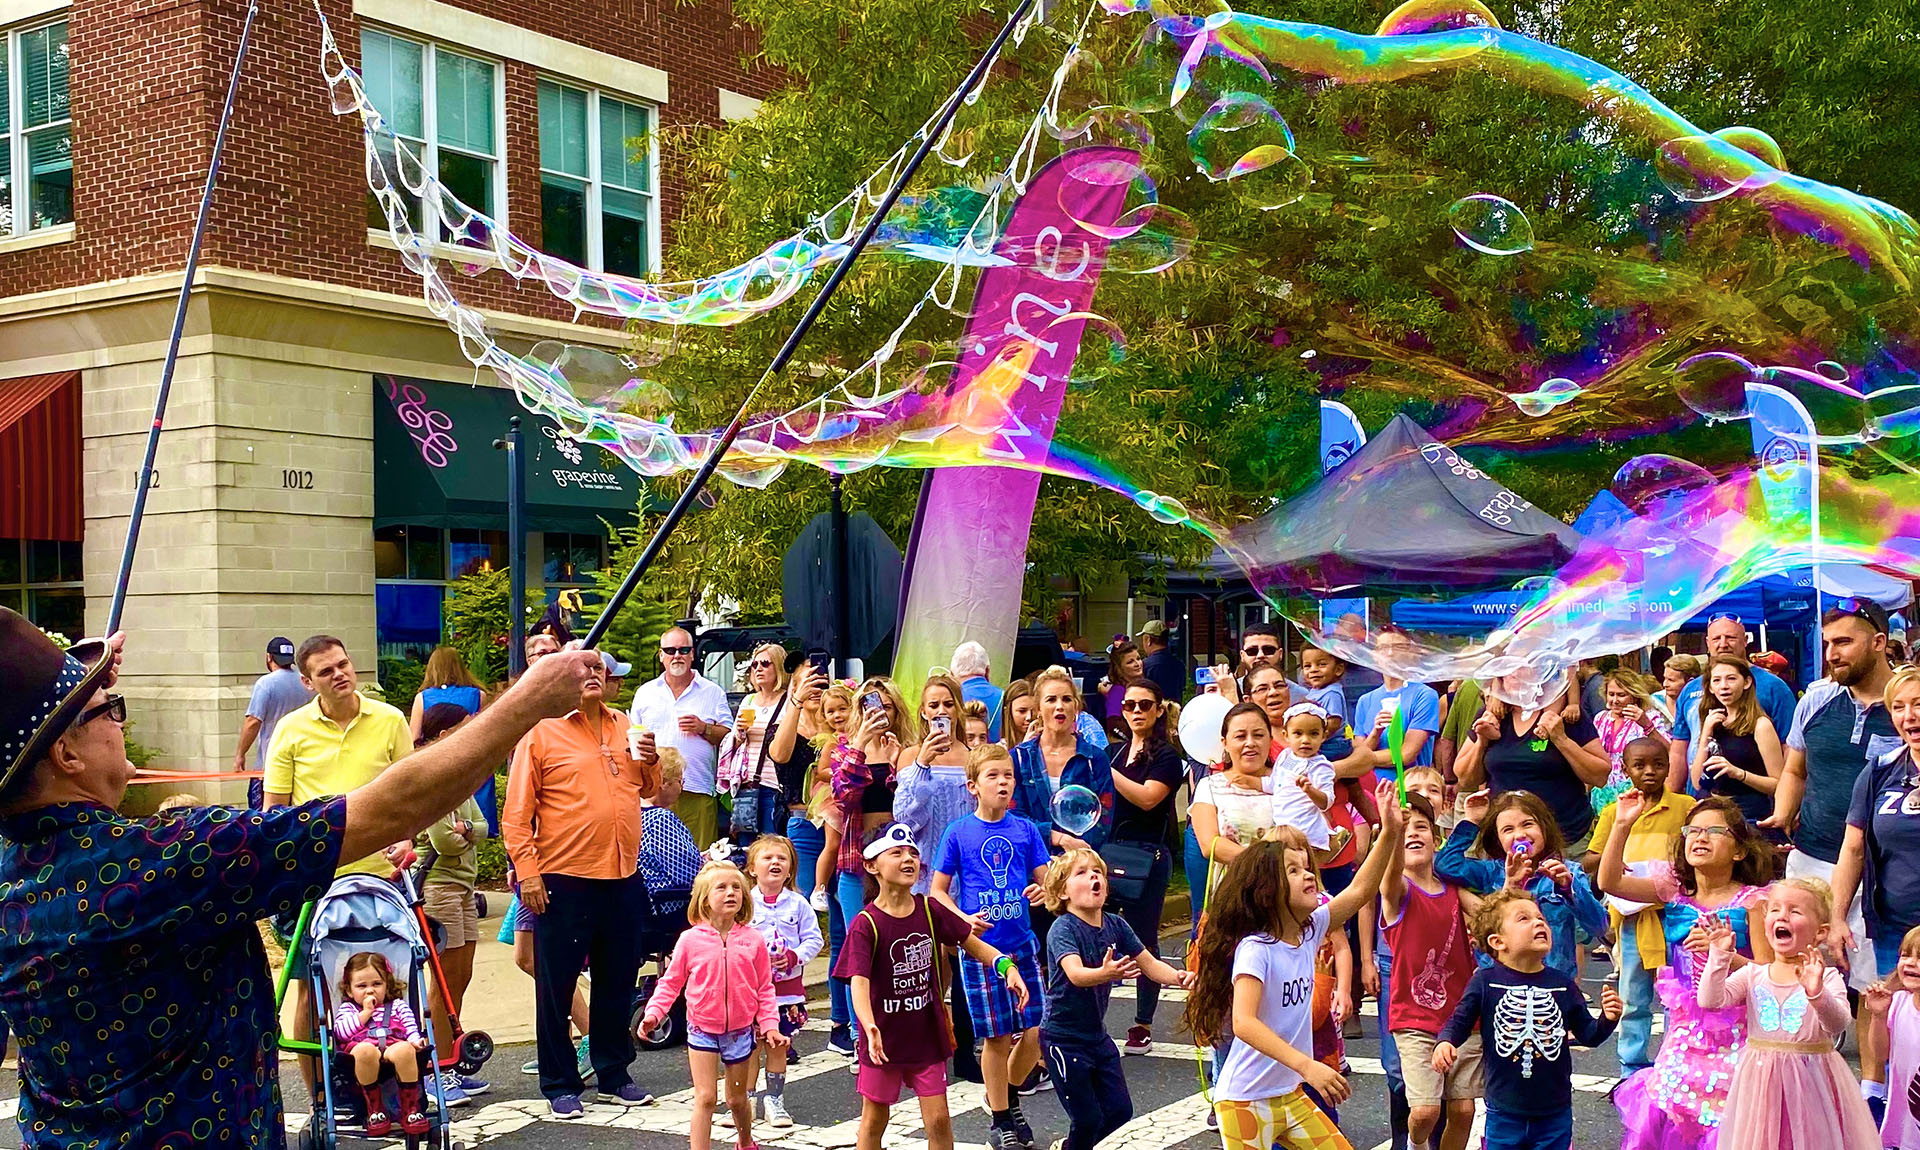 Kids Love Steve's Outdoor Bubbles